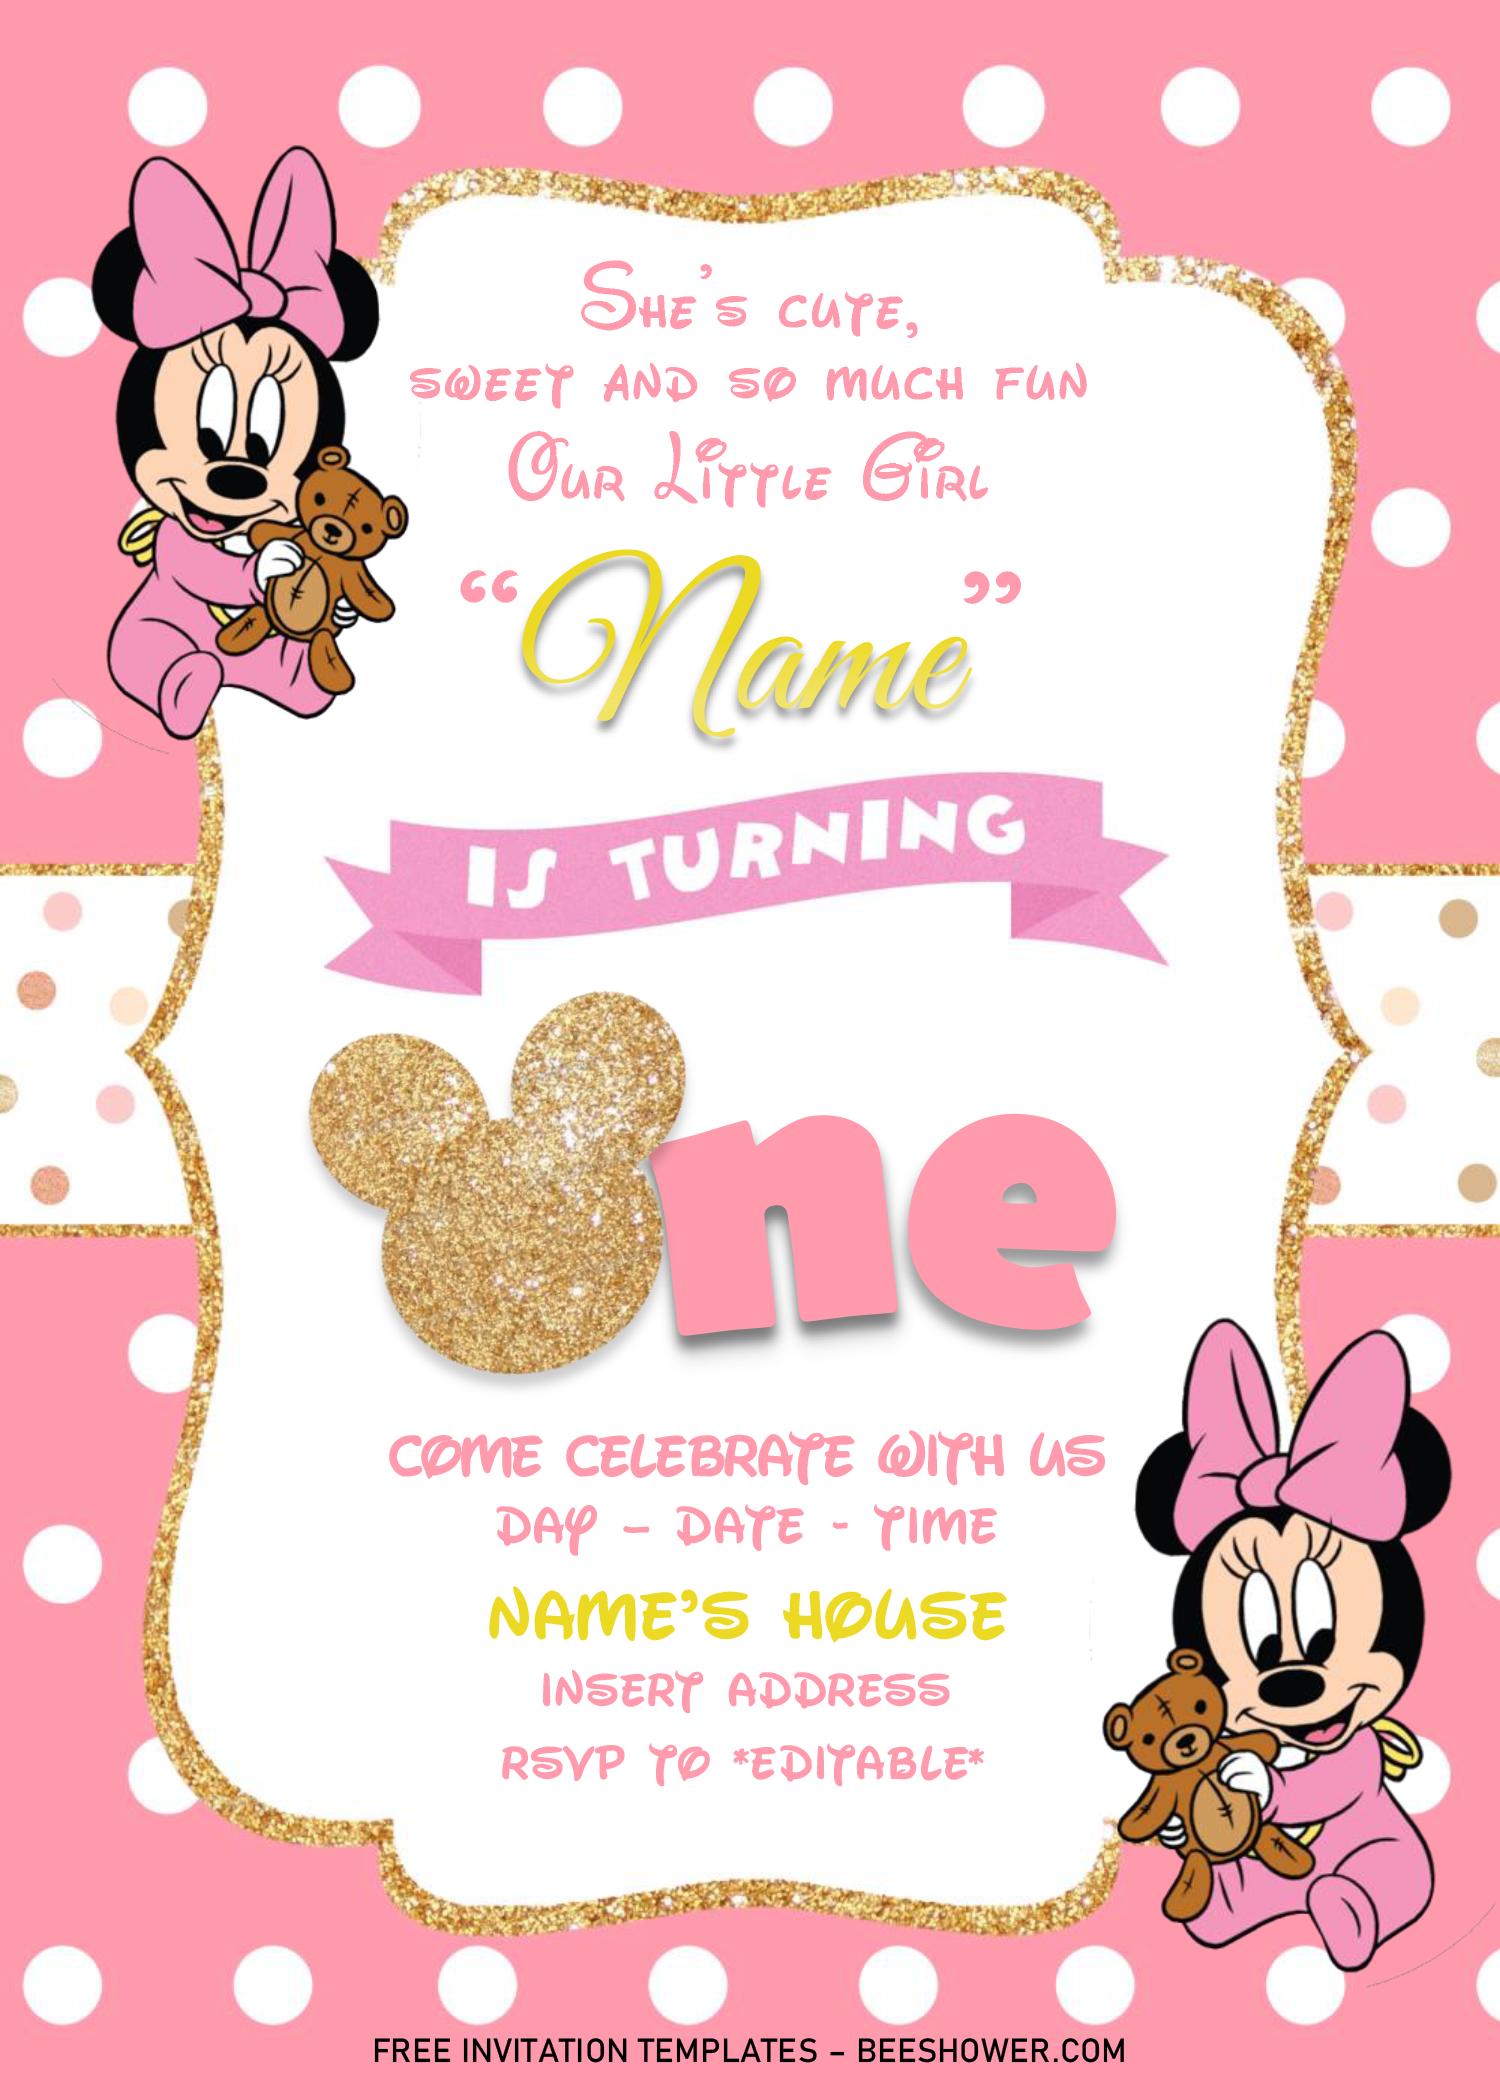 Gold Glitter Minnie Mouse Birthday Invitation Templates Editable Docx Minnie Mouse Birthday Invitations Minnie Invitations Minnie Mouse 1st Birthday